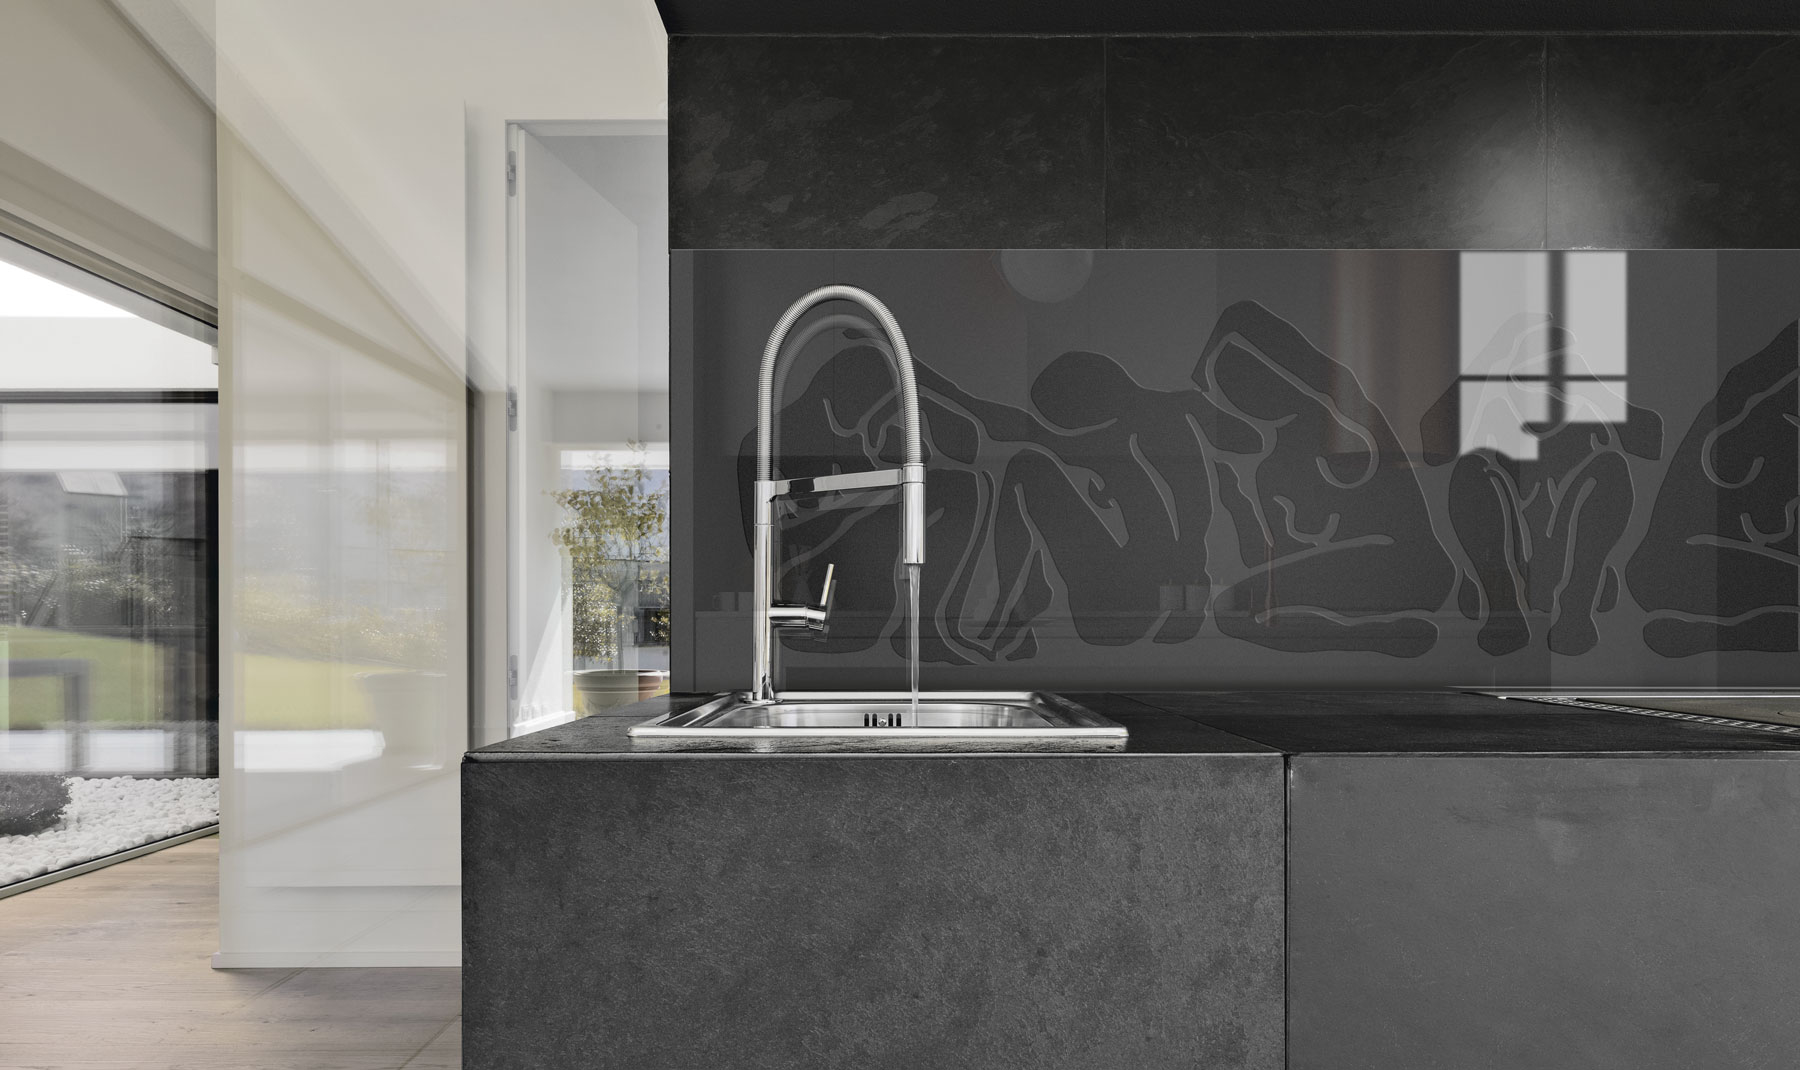 venus-ardoise-scintillant-collection-designer-A&P-sorigue-riouglass